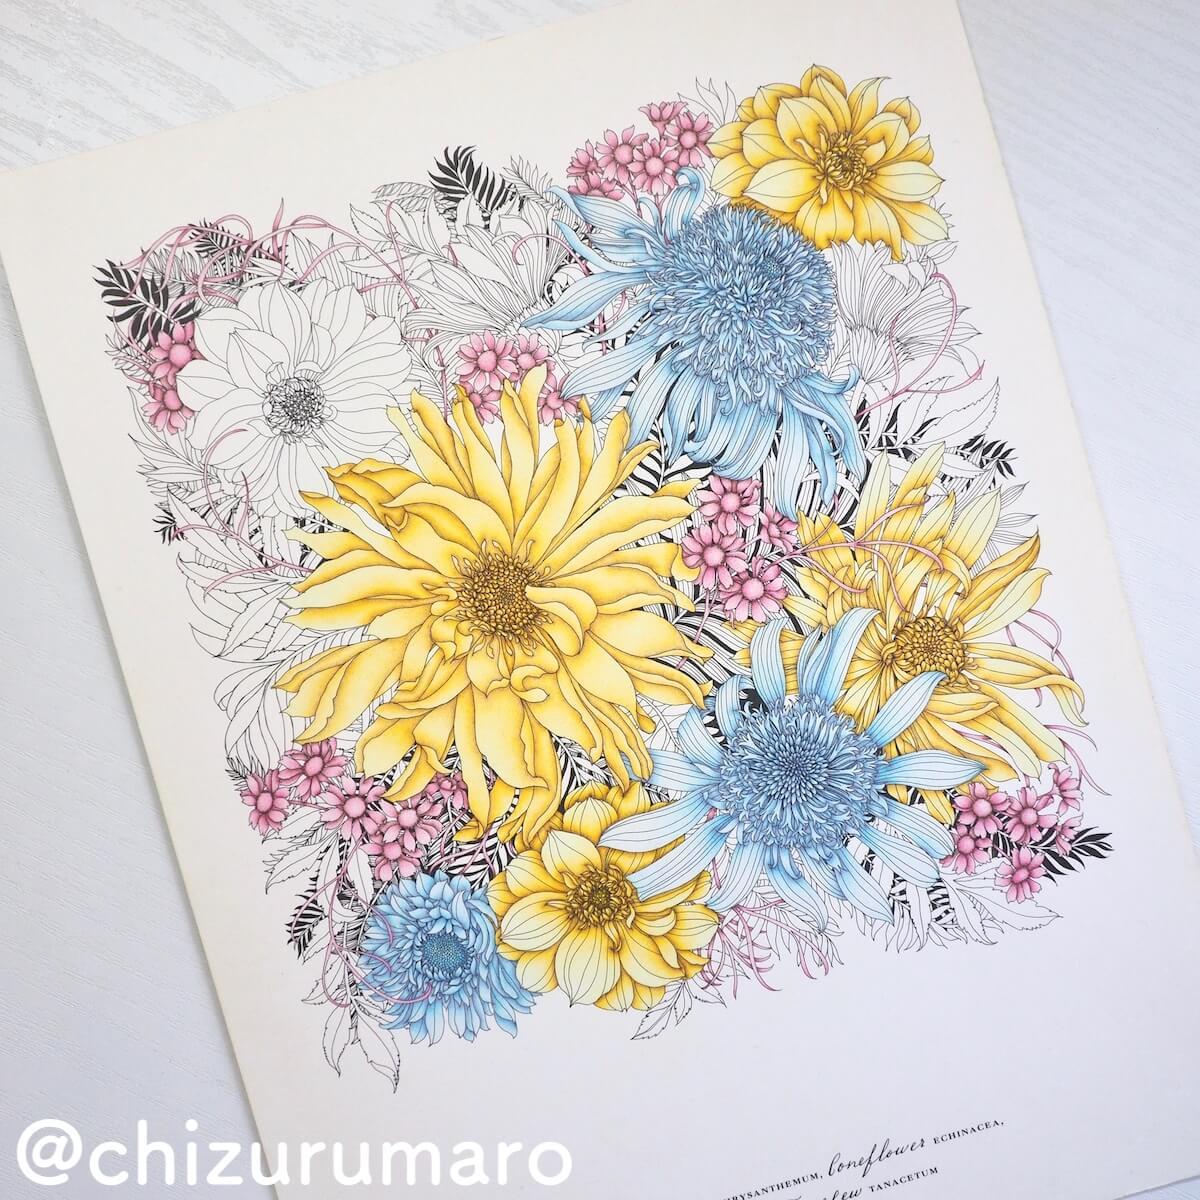 f:id:chizurumaro:20190427143918j:plain